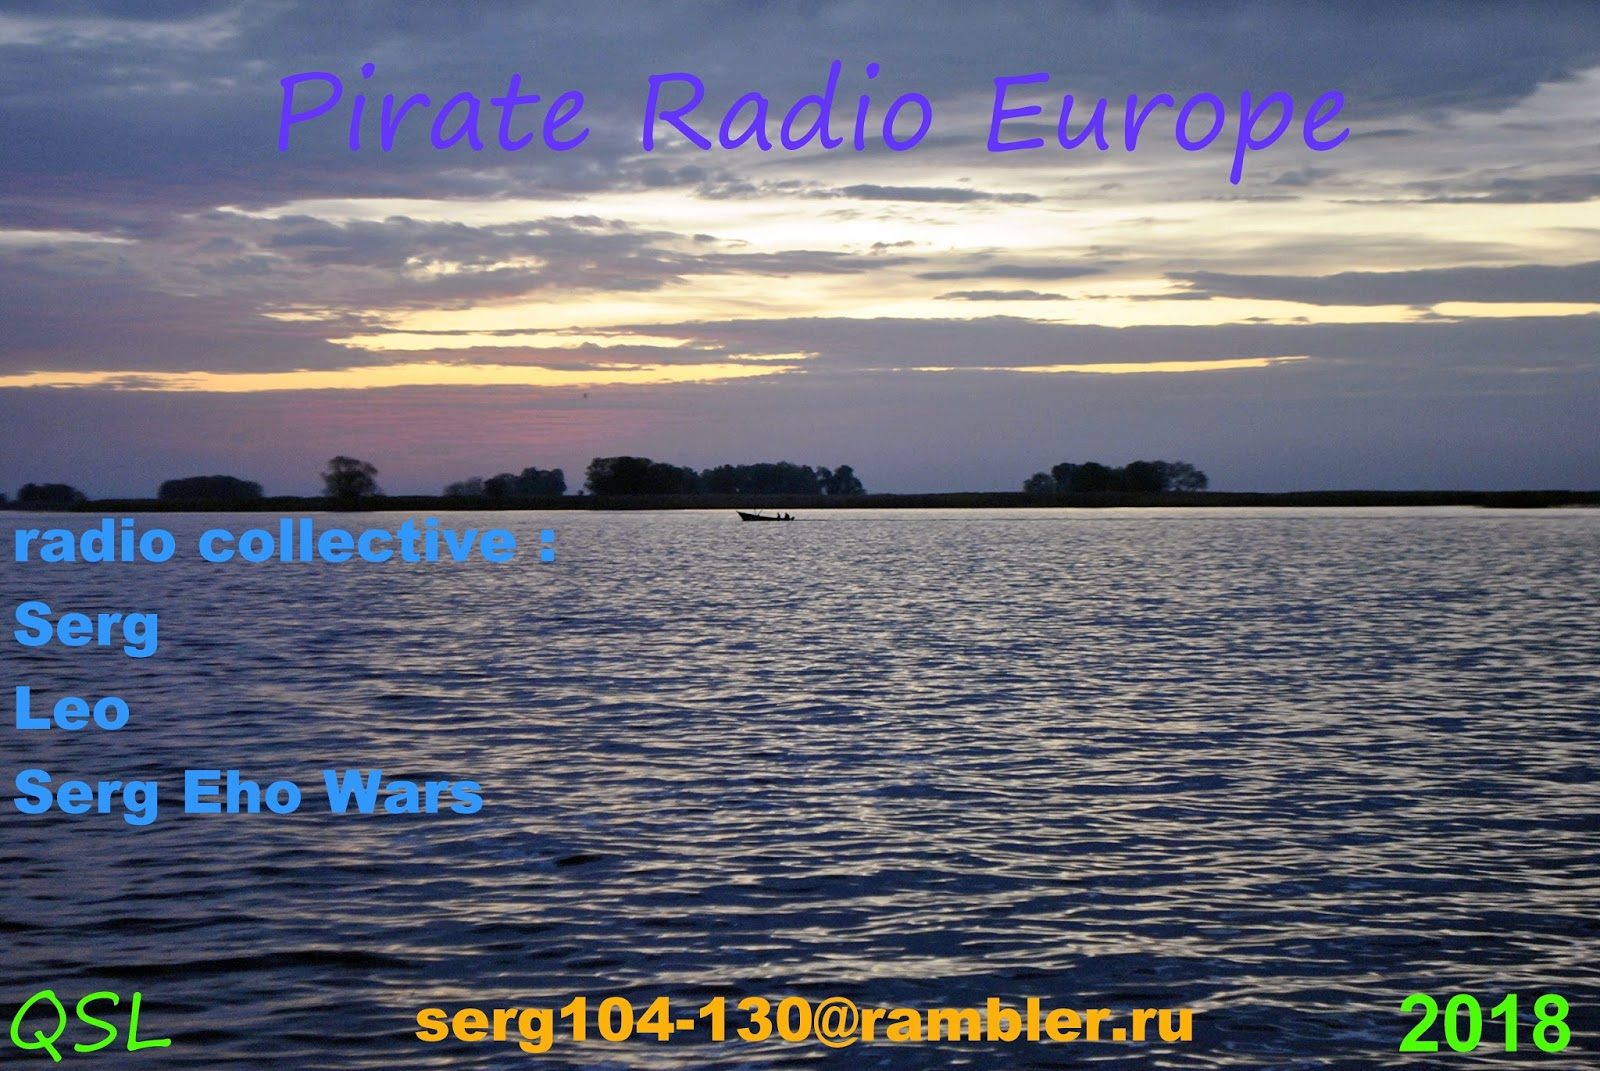 Shortwave DX blog: Pirate Radio Europe eQSLs